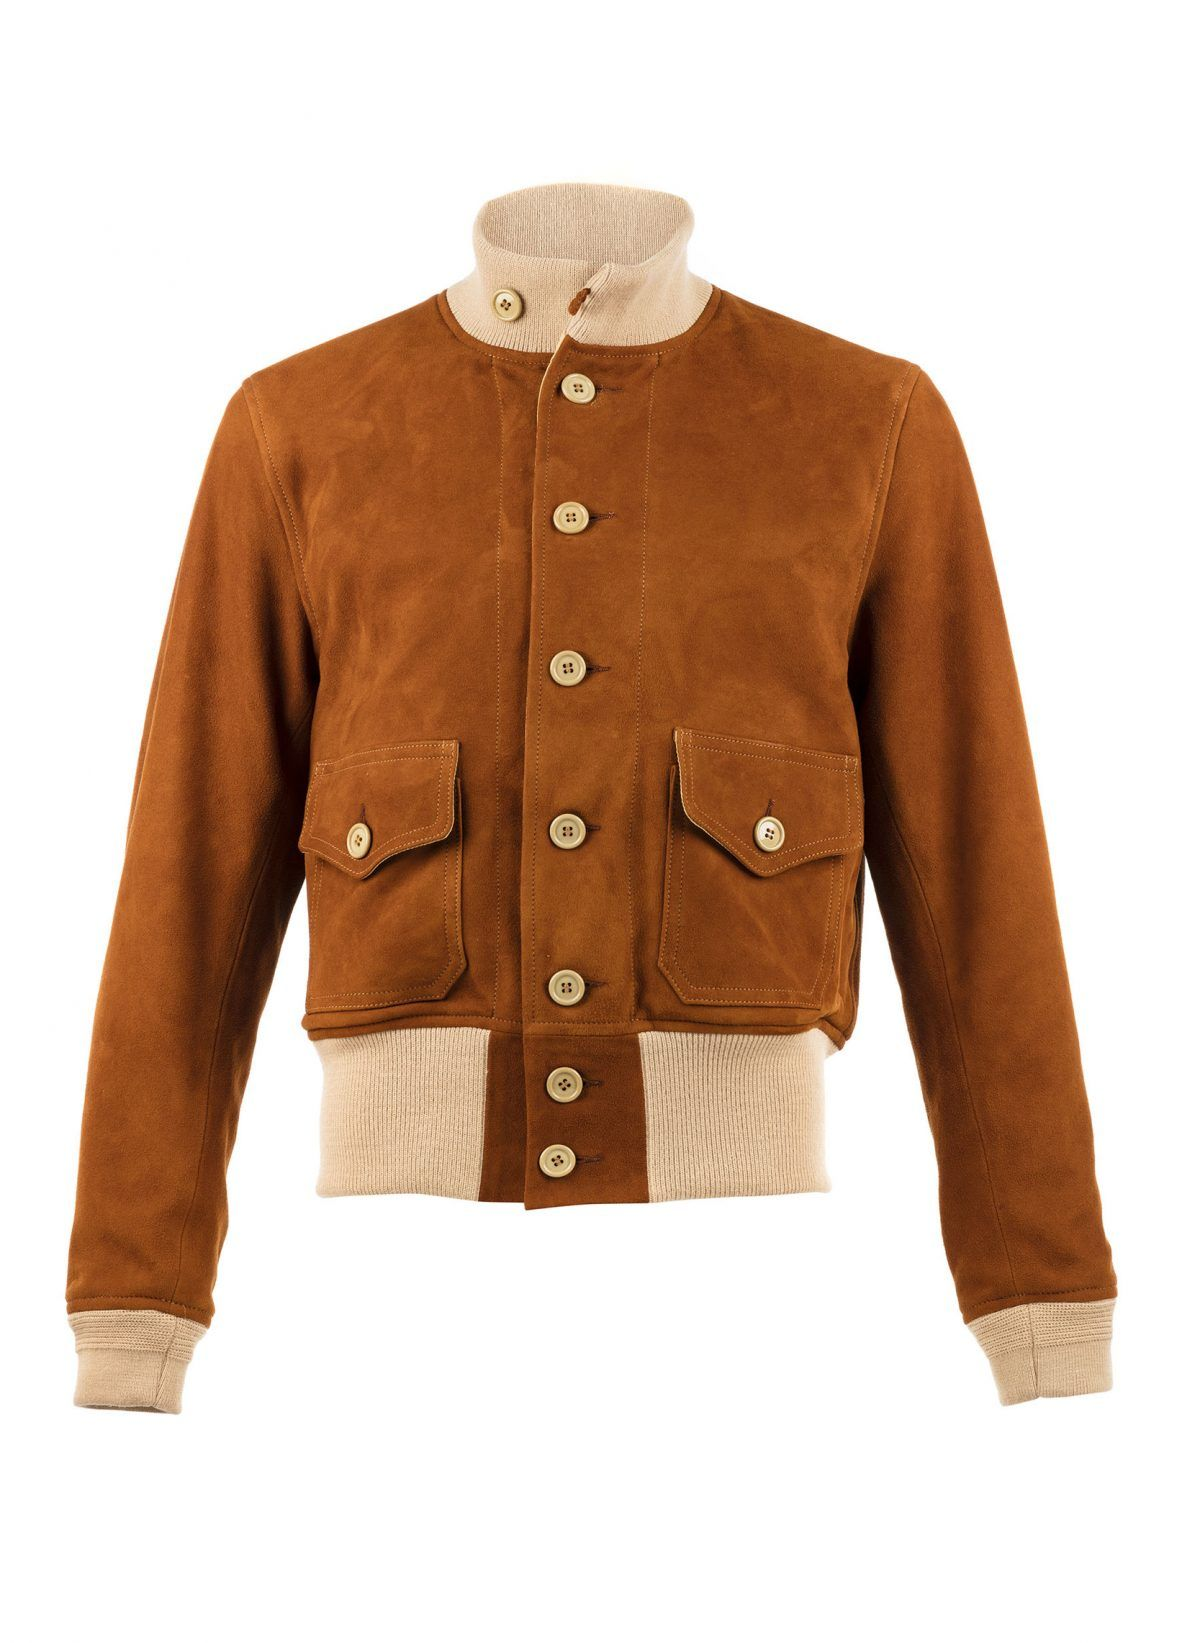 CHAPAL jacket A1 Ambassade